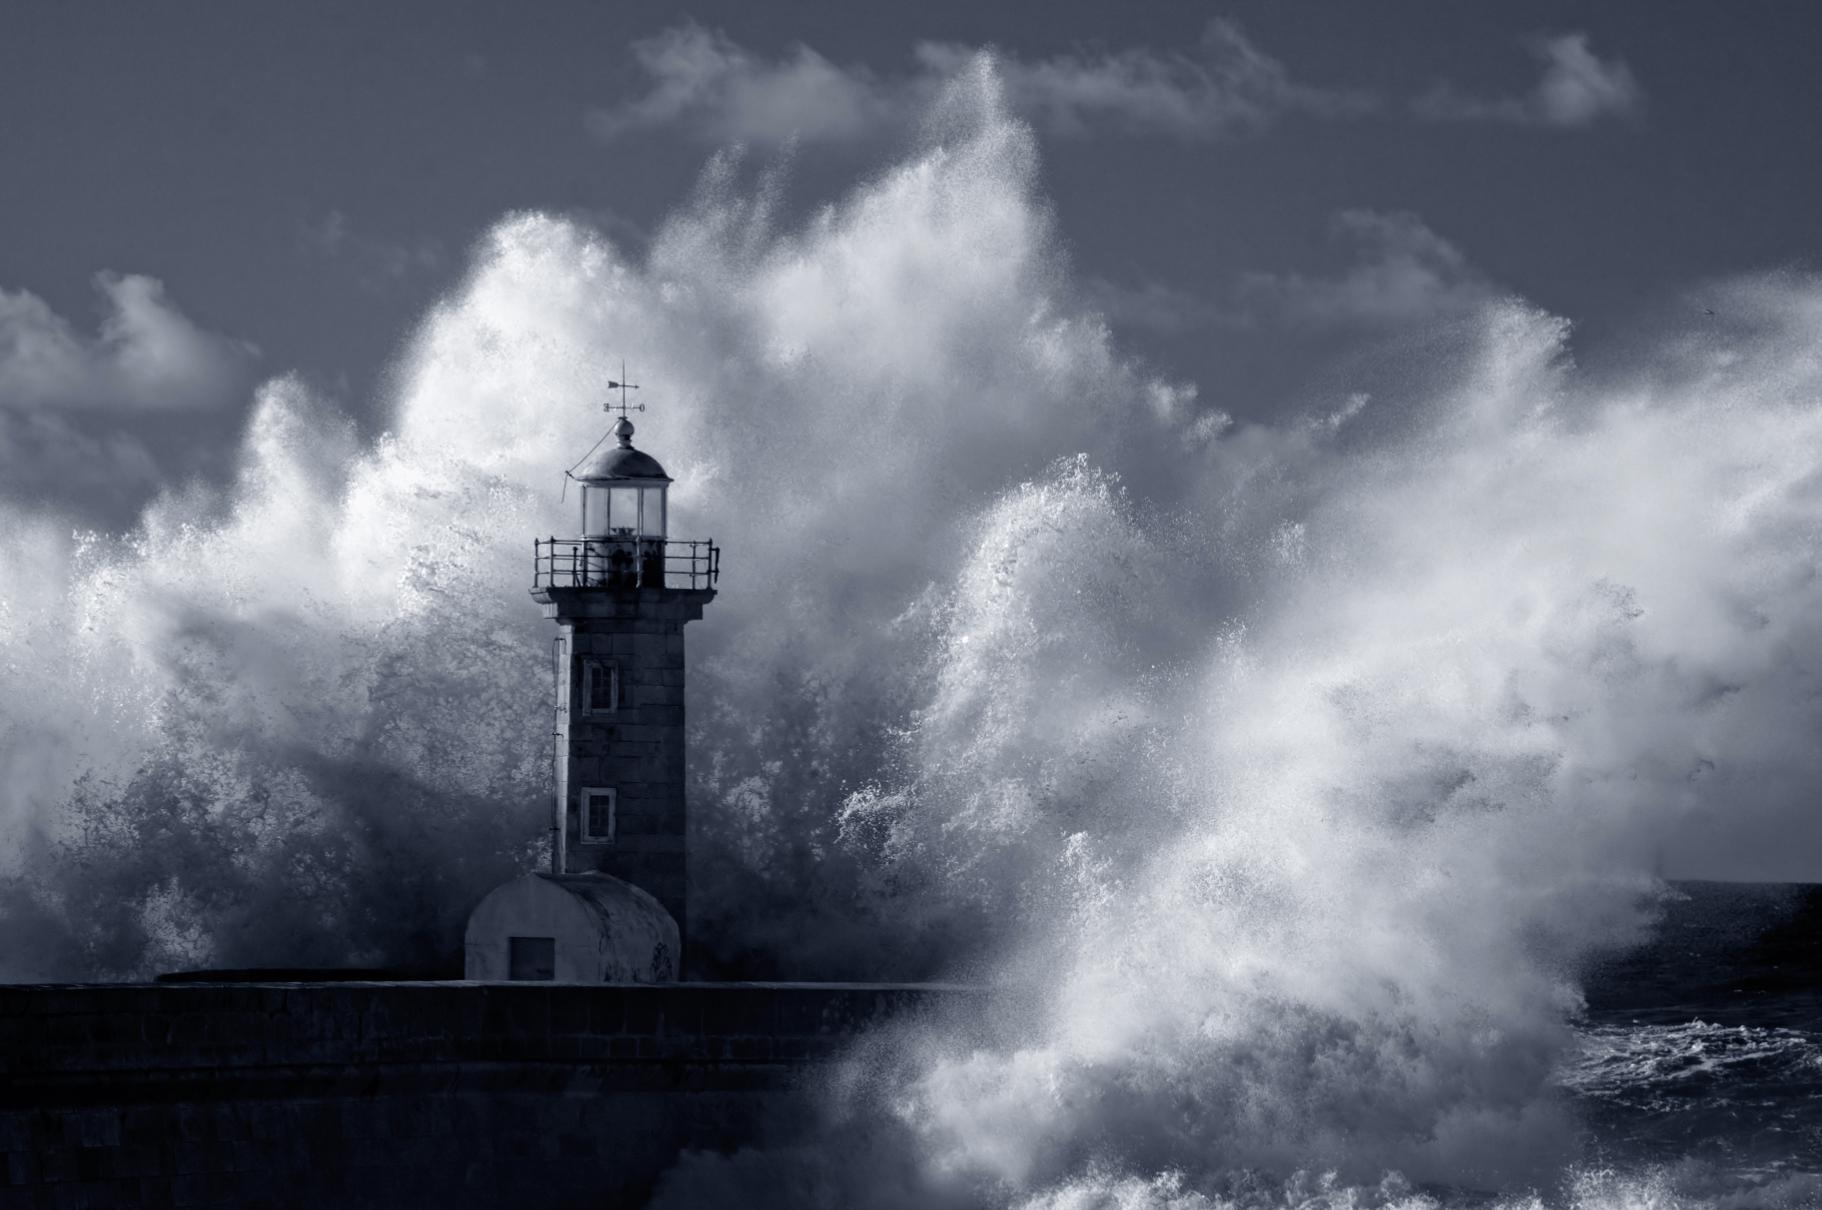 stormy attitudes